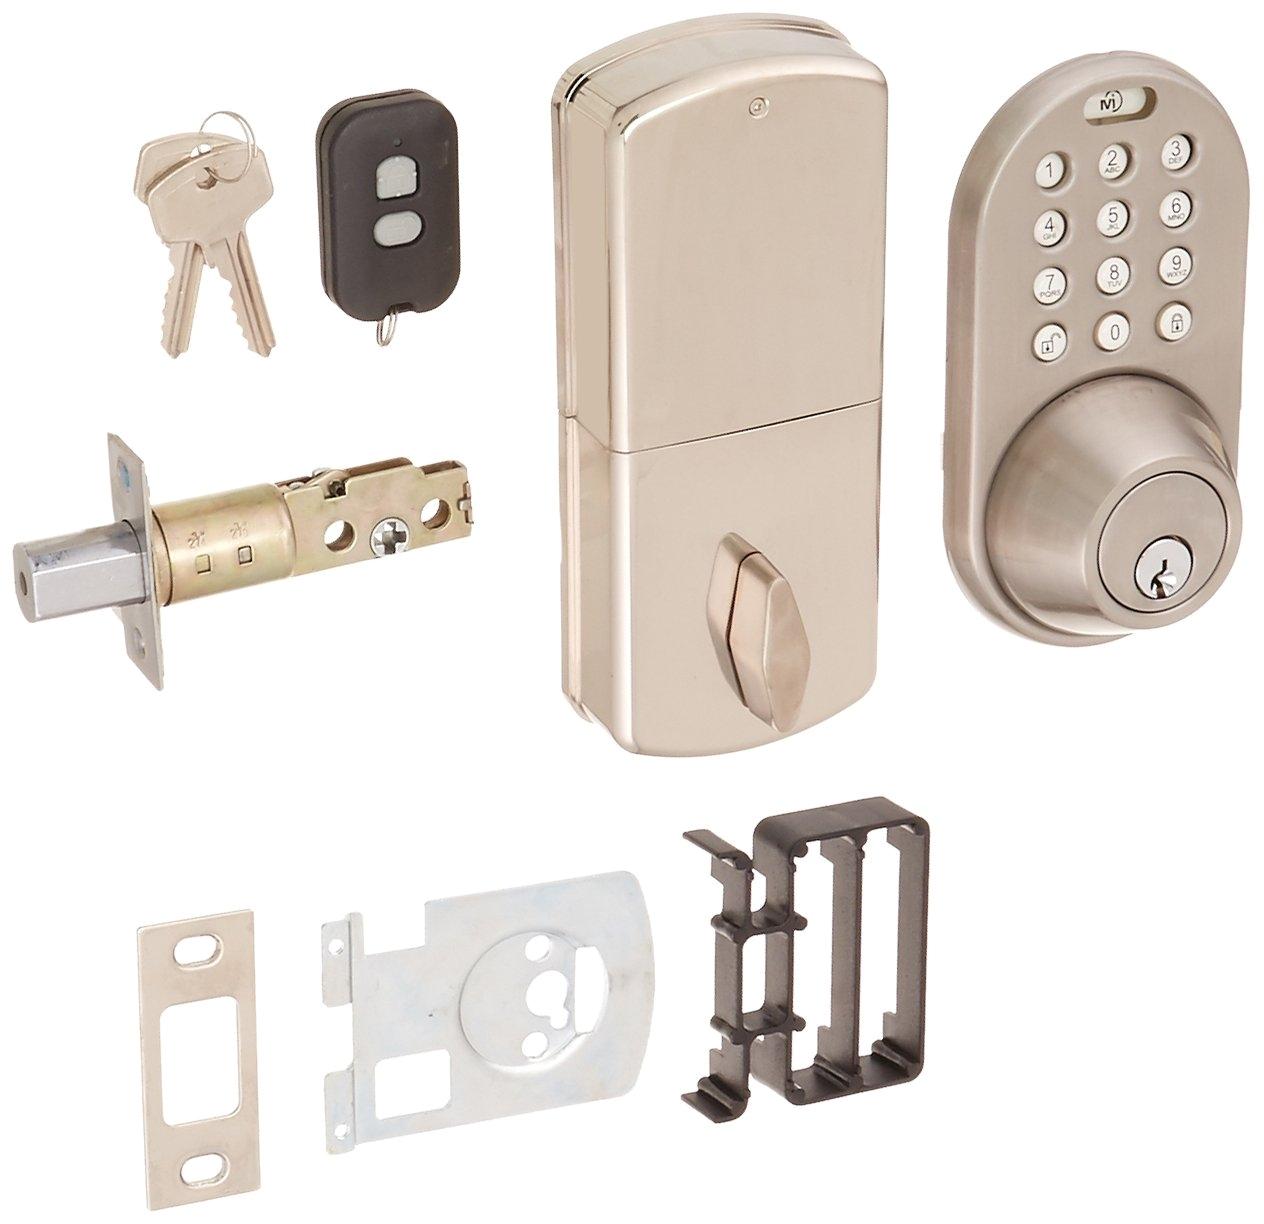 get quotations a milocks xf 02sn digital deadbolt door lock with keyless entry via remote control and keypad